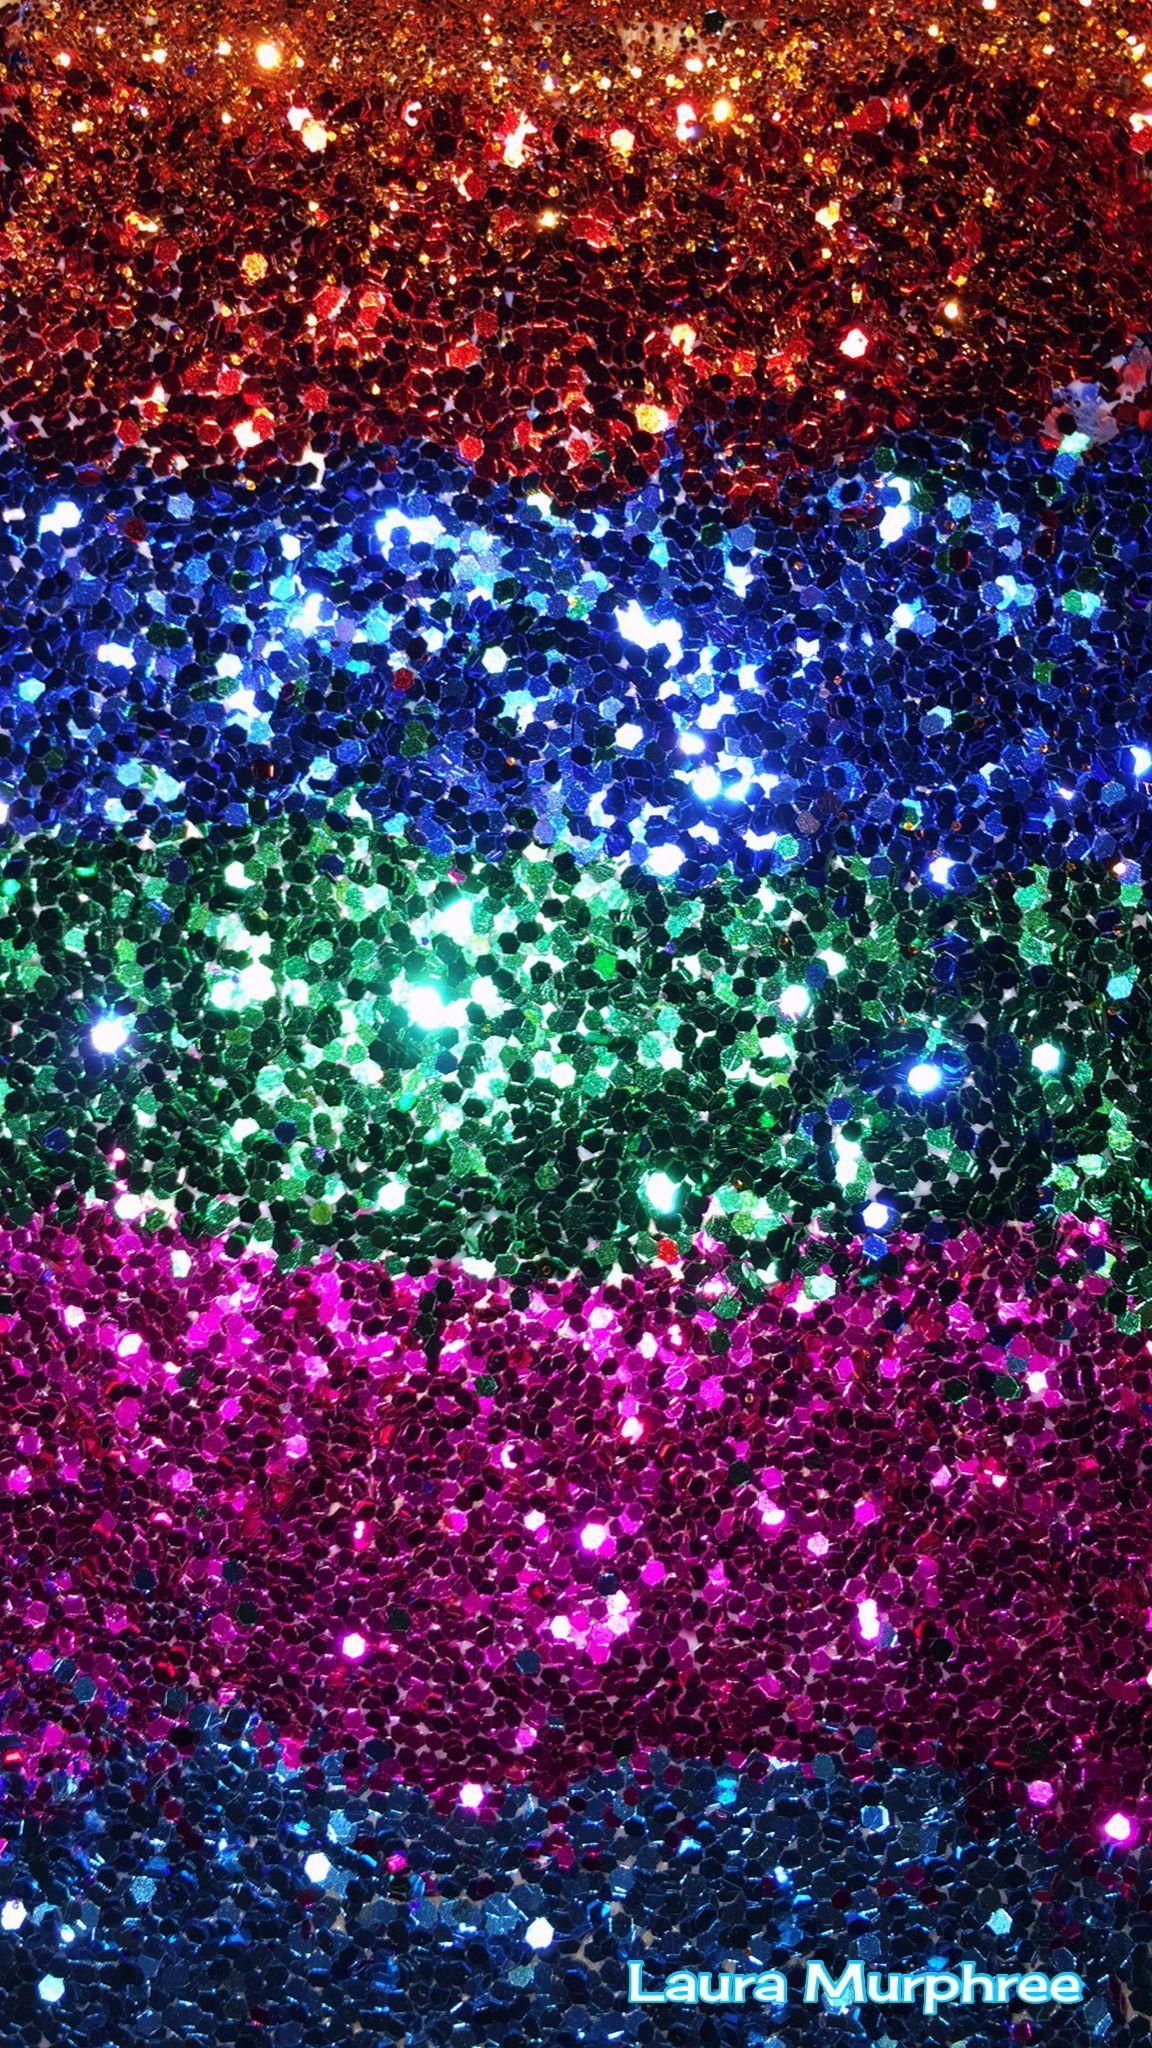 Glitter Phone Wallpaper Colorful Sparkle Background Sparkling Glittery Girly Glitterfondos Glitter Phone Wallpaper Iphone Wallpaper Glitter Glitter Wallpaper